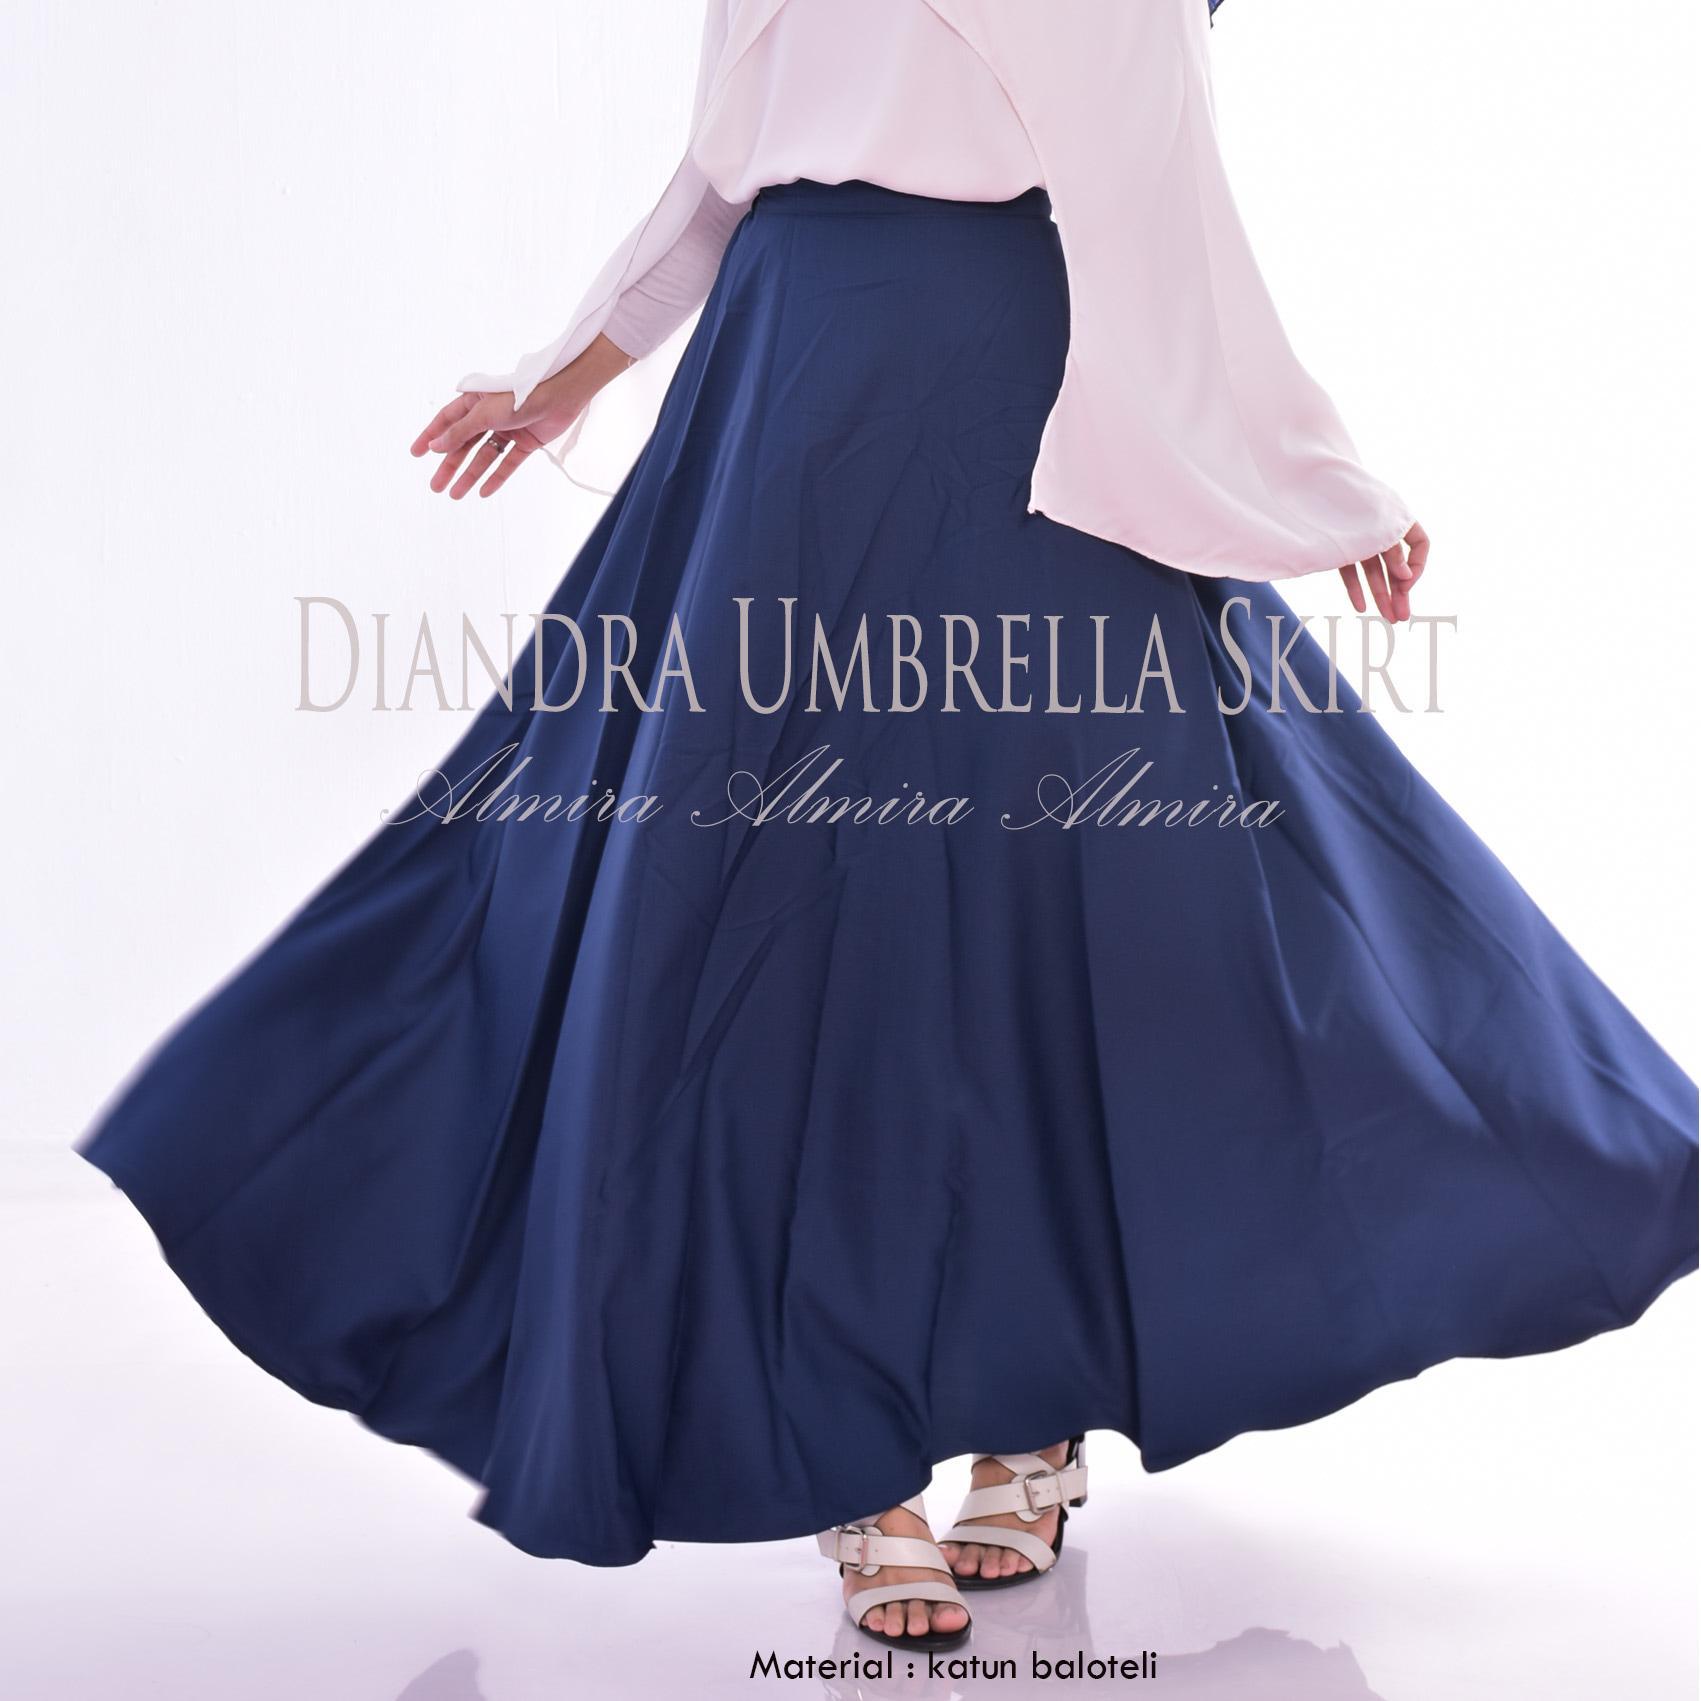 Rok Panjang Terbaru Diandra Umbrella Skirt Katun Baloteli  Hitam